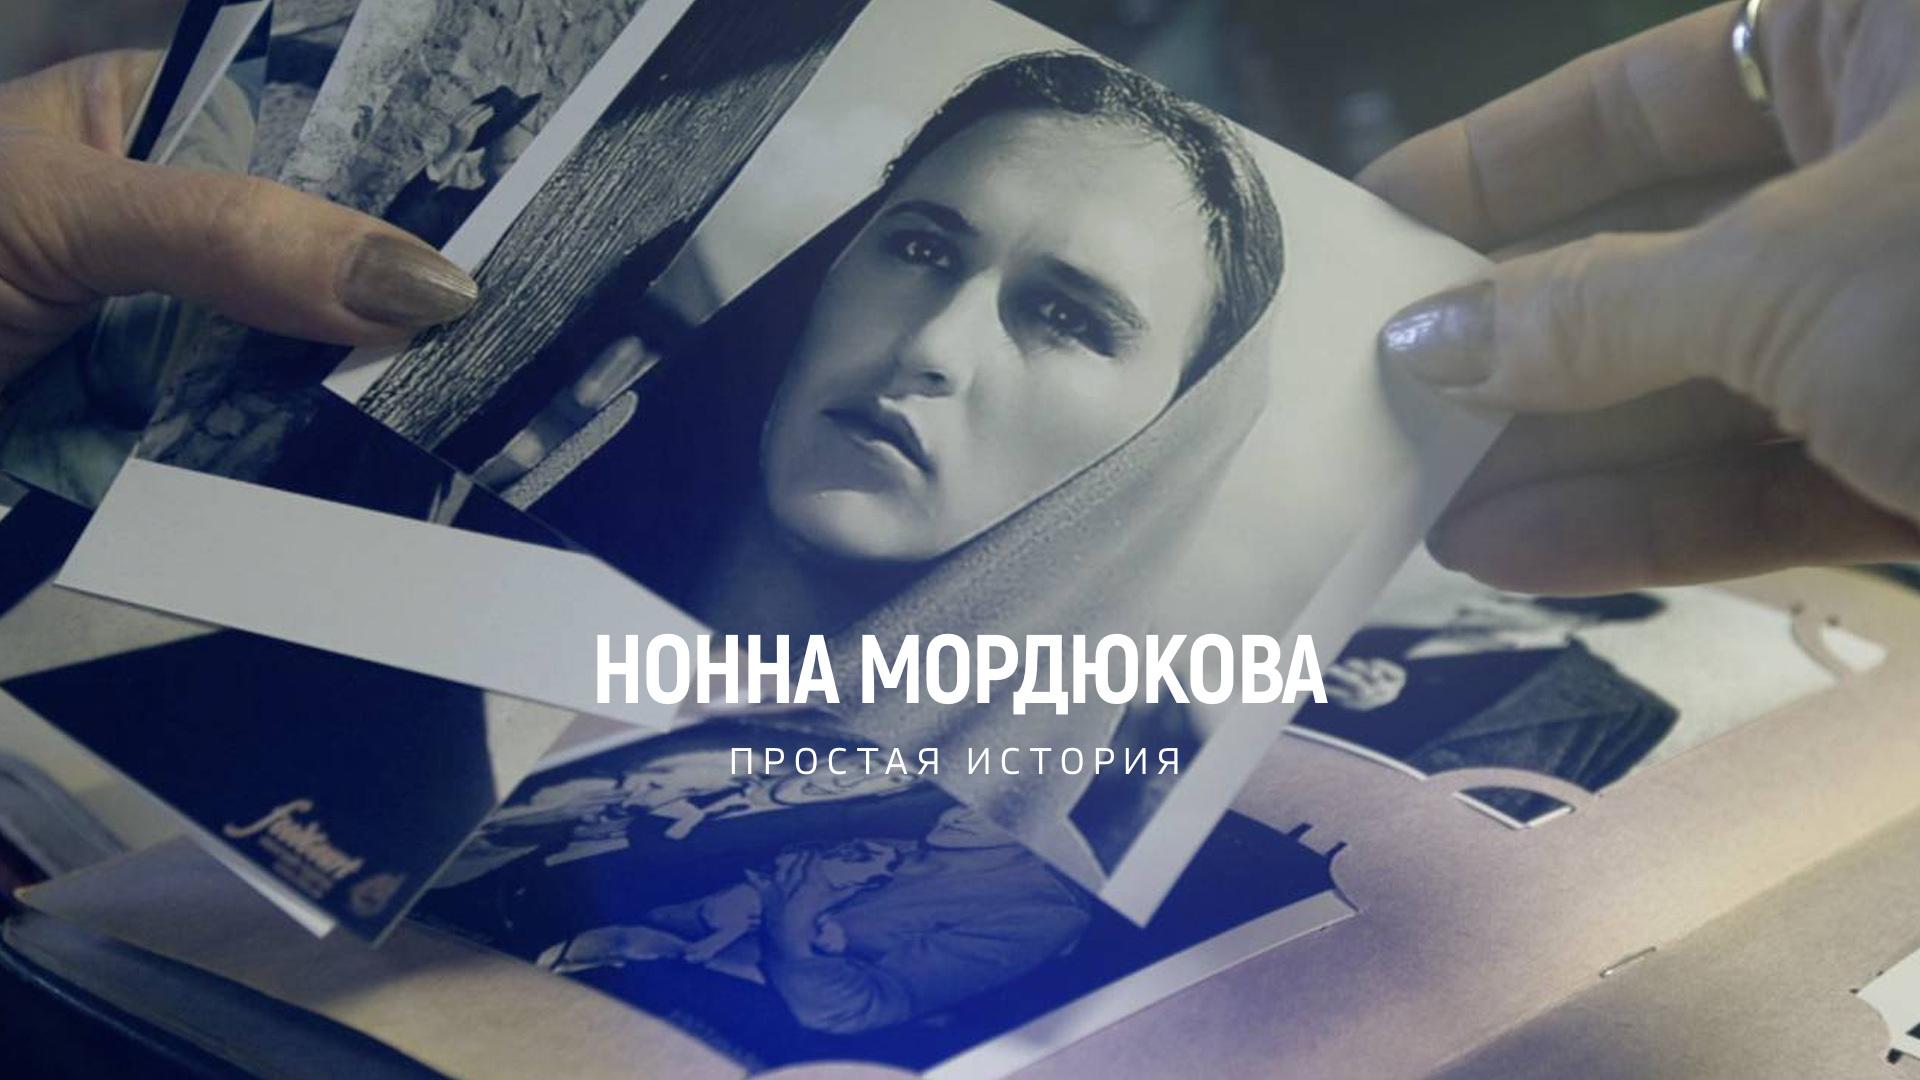 Нонна Мордюкова. Простая история